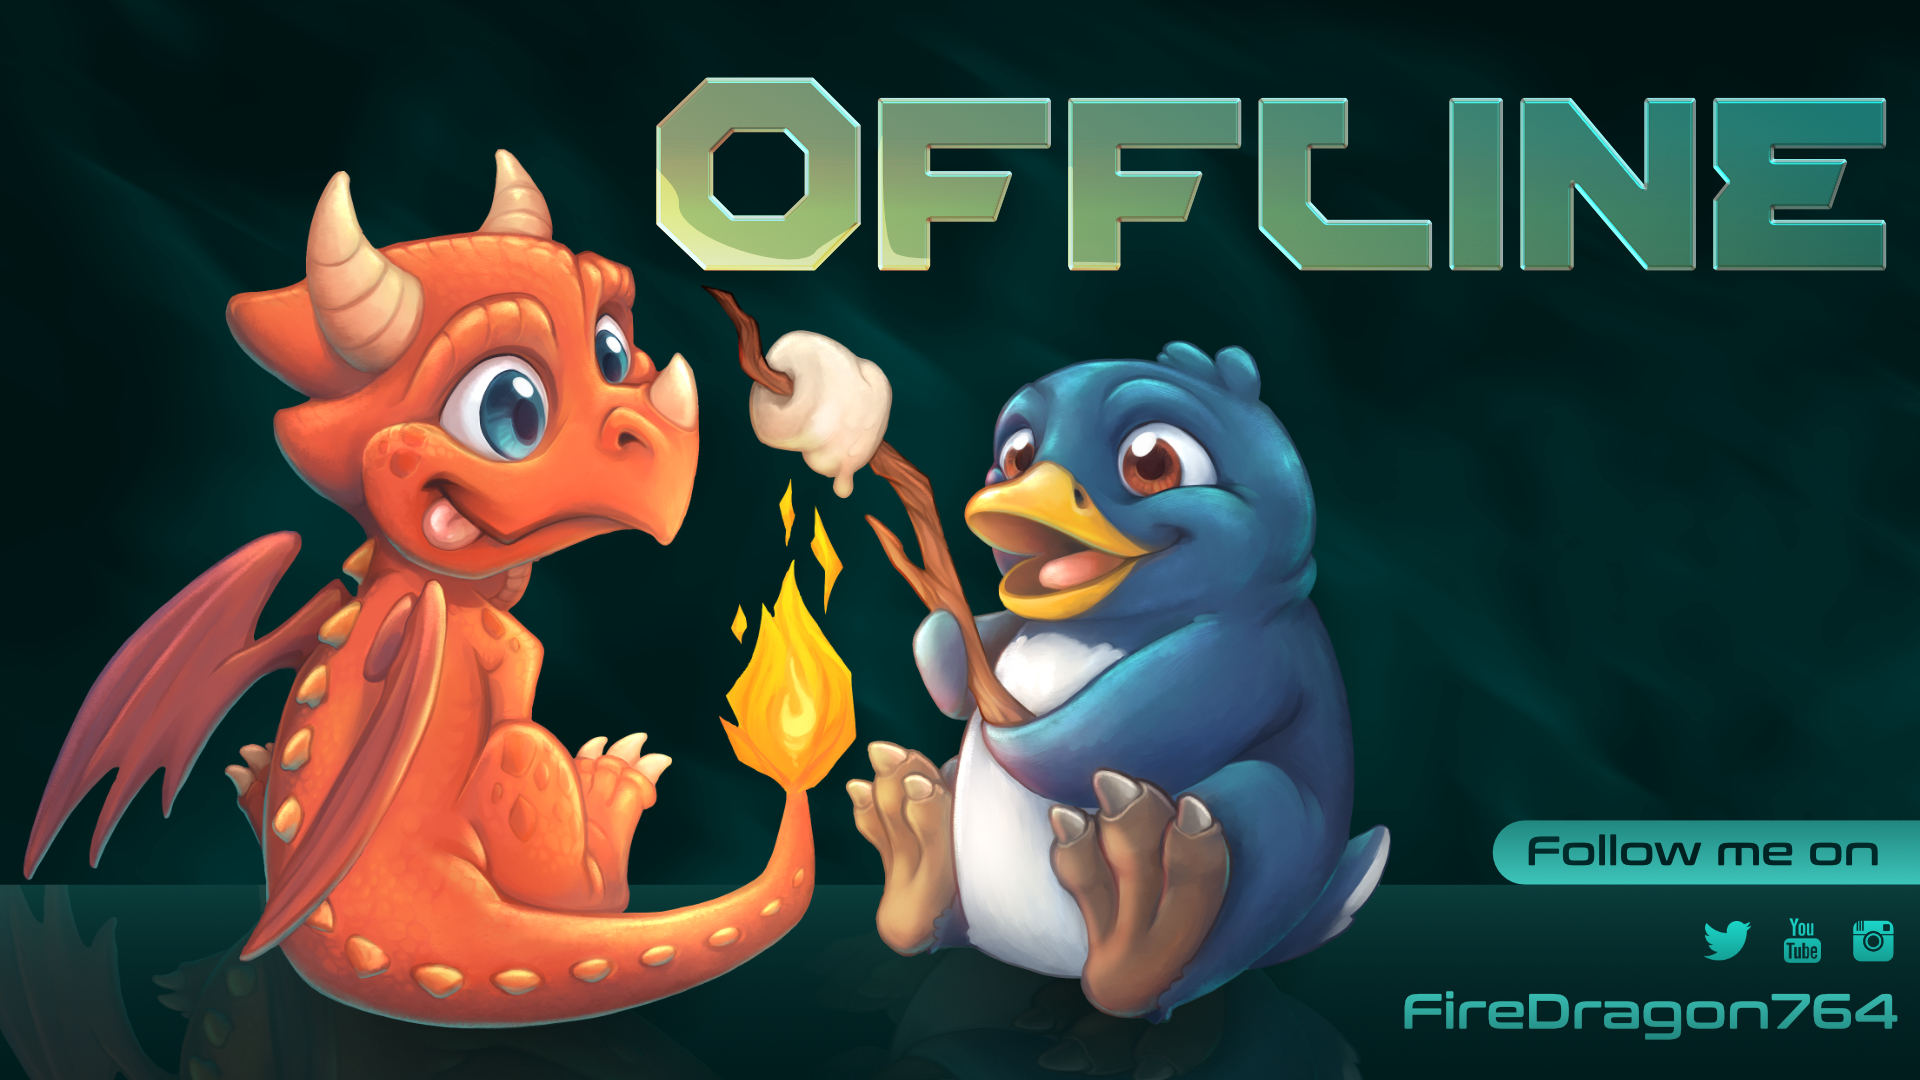 Offline_Wallpaper.jpg